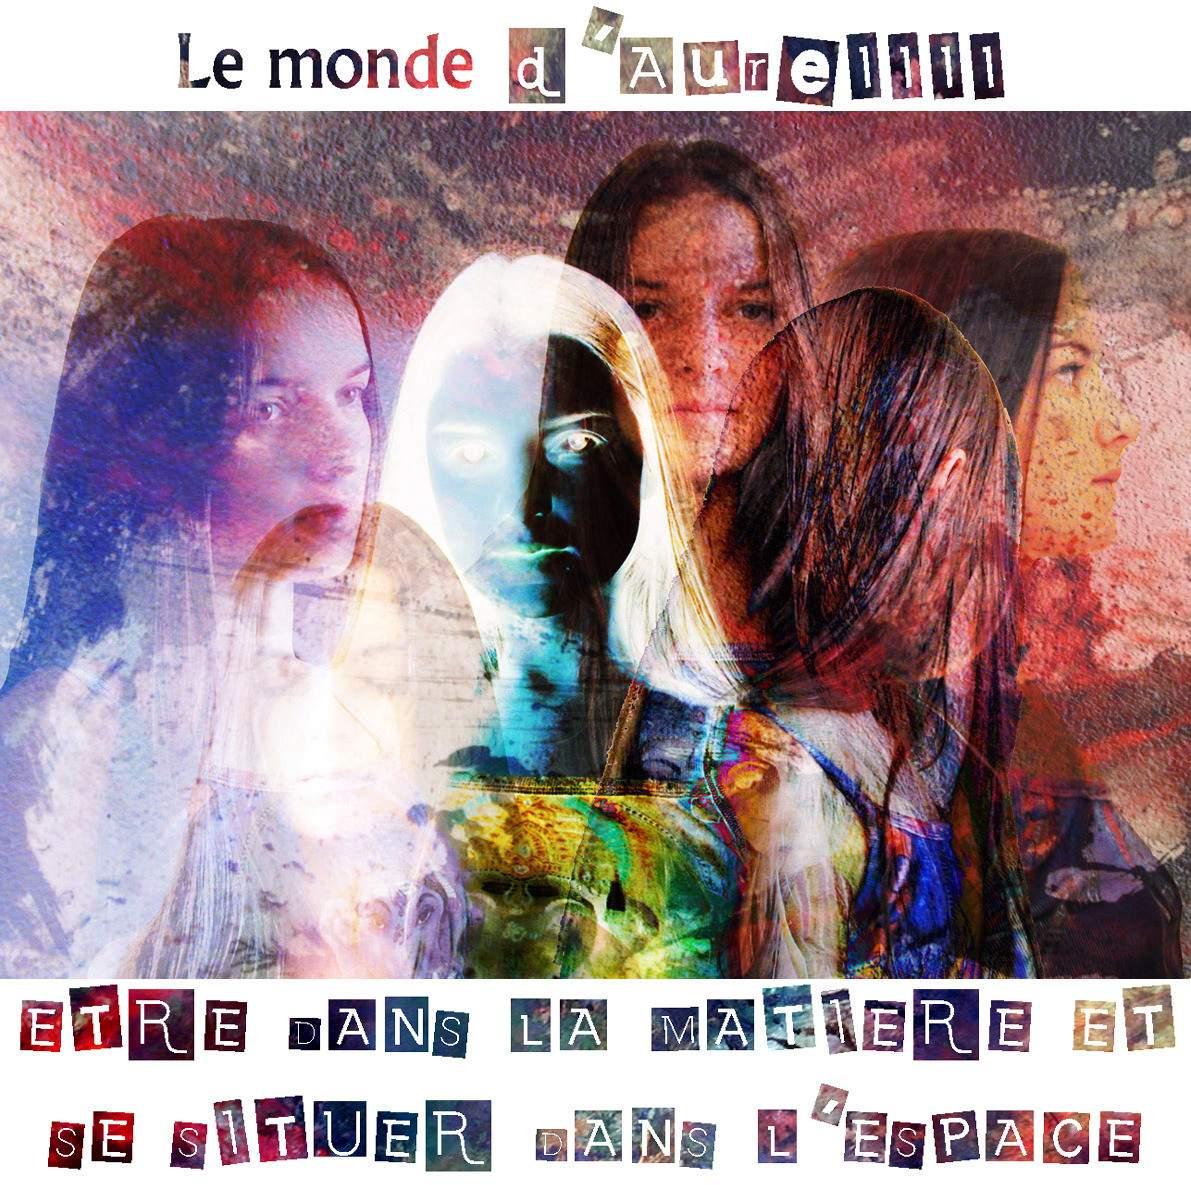 Aurellll Artiste plasticienne  - Le monde d'Aurellll